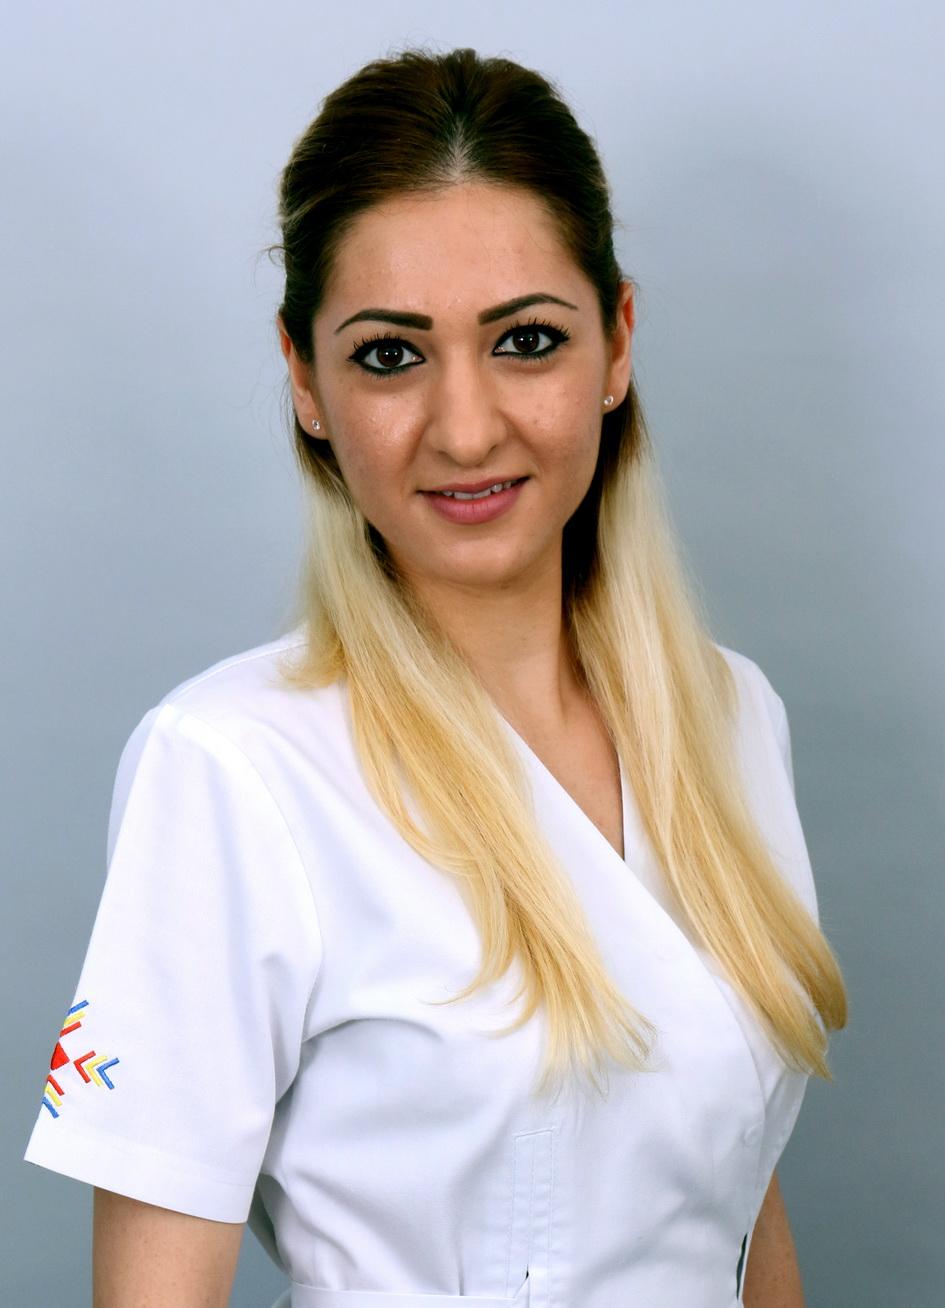 Ana-Maria Dumitrescu